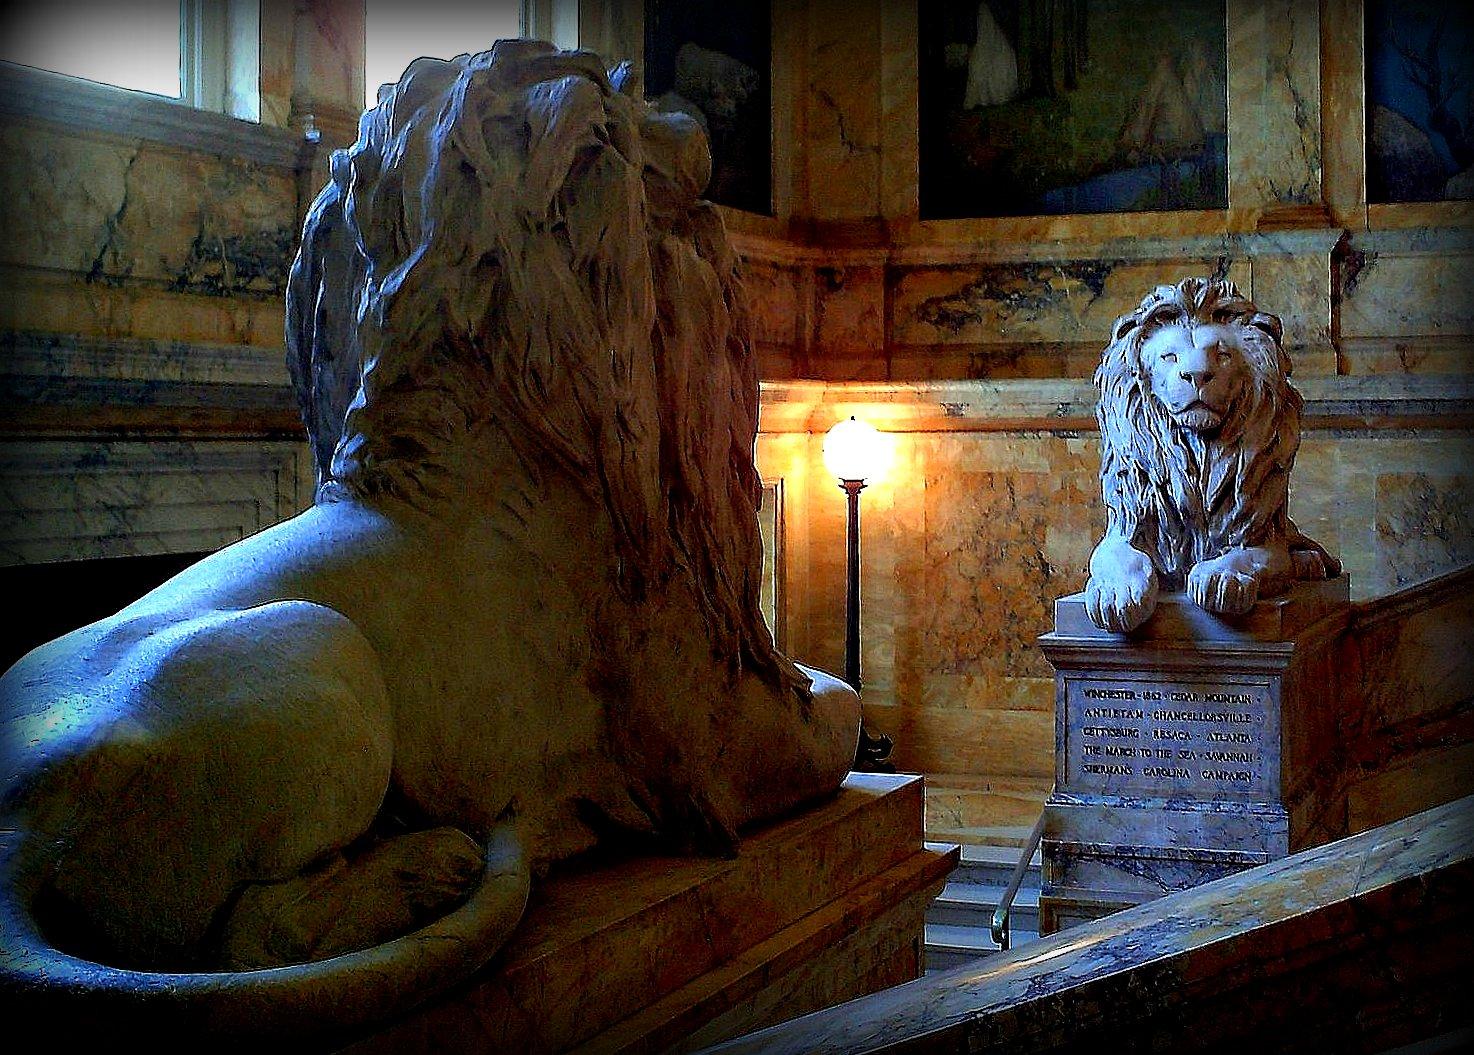 lions, library, boston, massachusetts, large